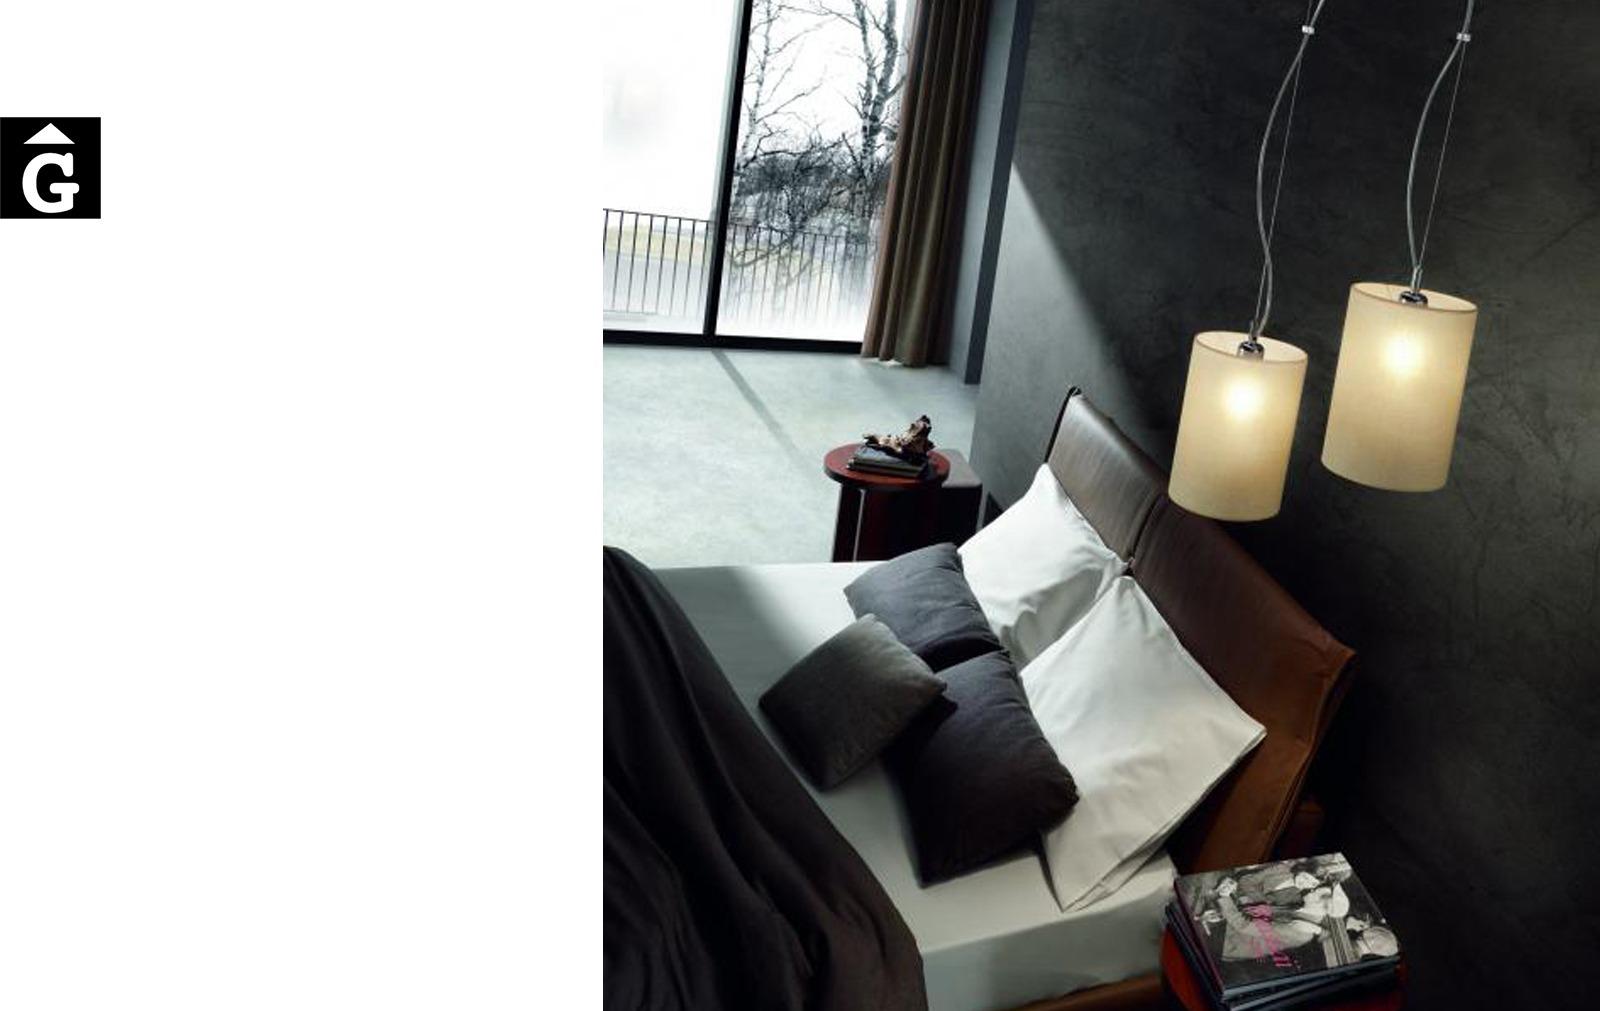 Rho Llit entapissat superior Moradillo llit entapissats per mobles Gifreu